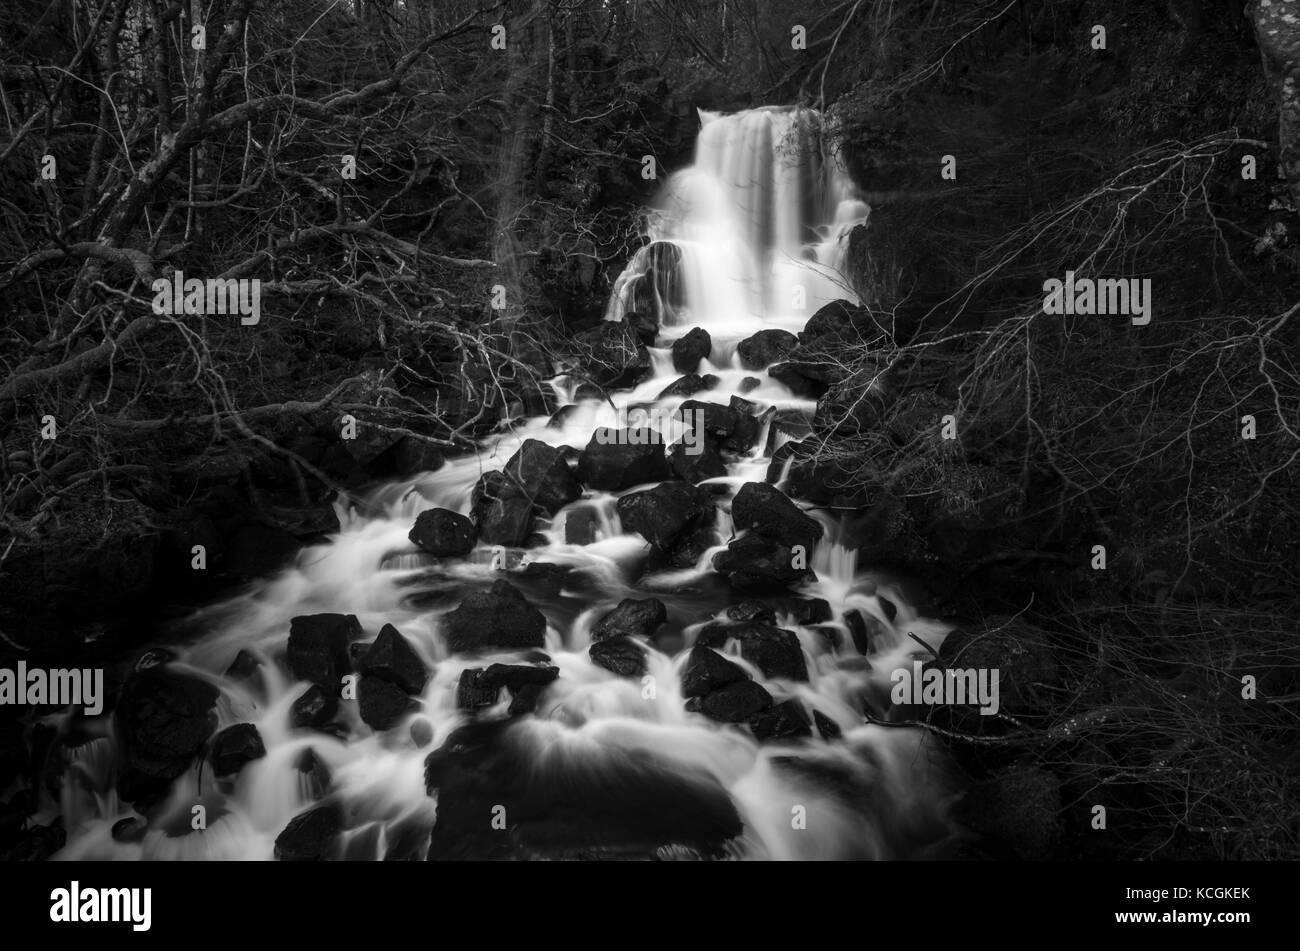 Lower falls, waterfall, Aros burn, Aros Park, near Tobermory, Isle of Mull, Hebrides, Argyll and Bute, Scotland - Stock Image